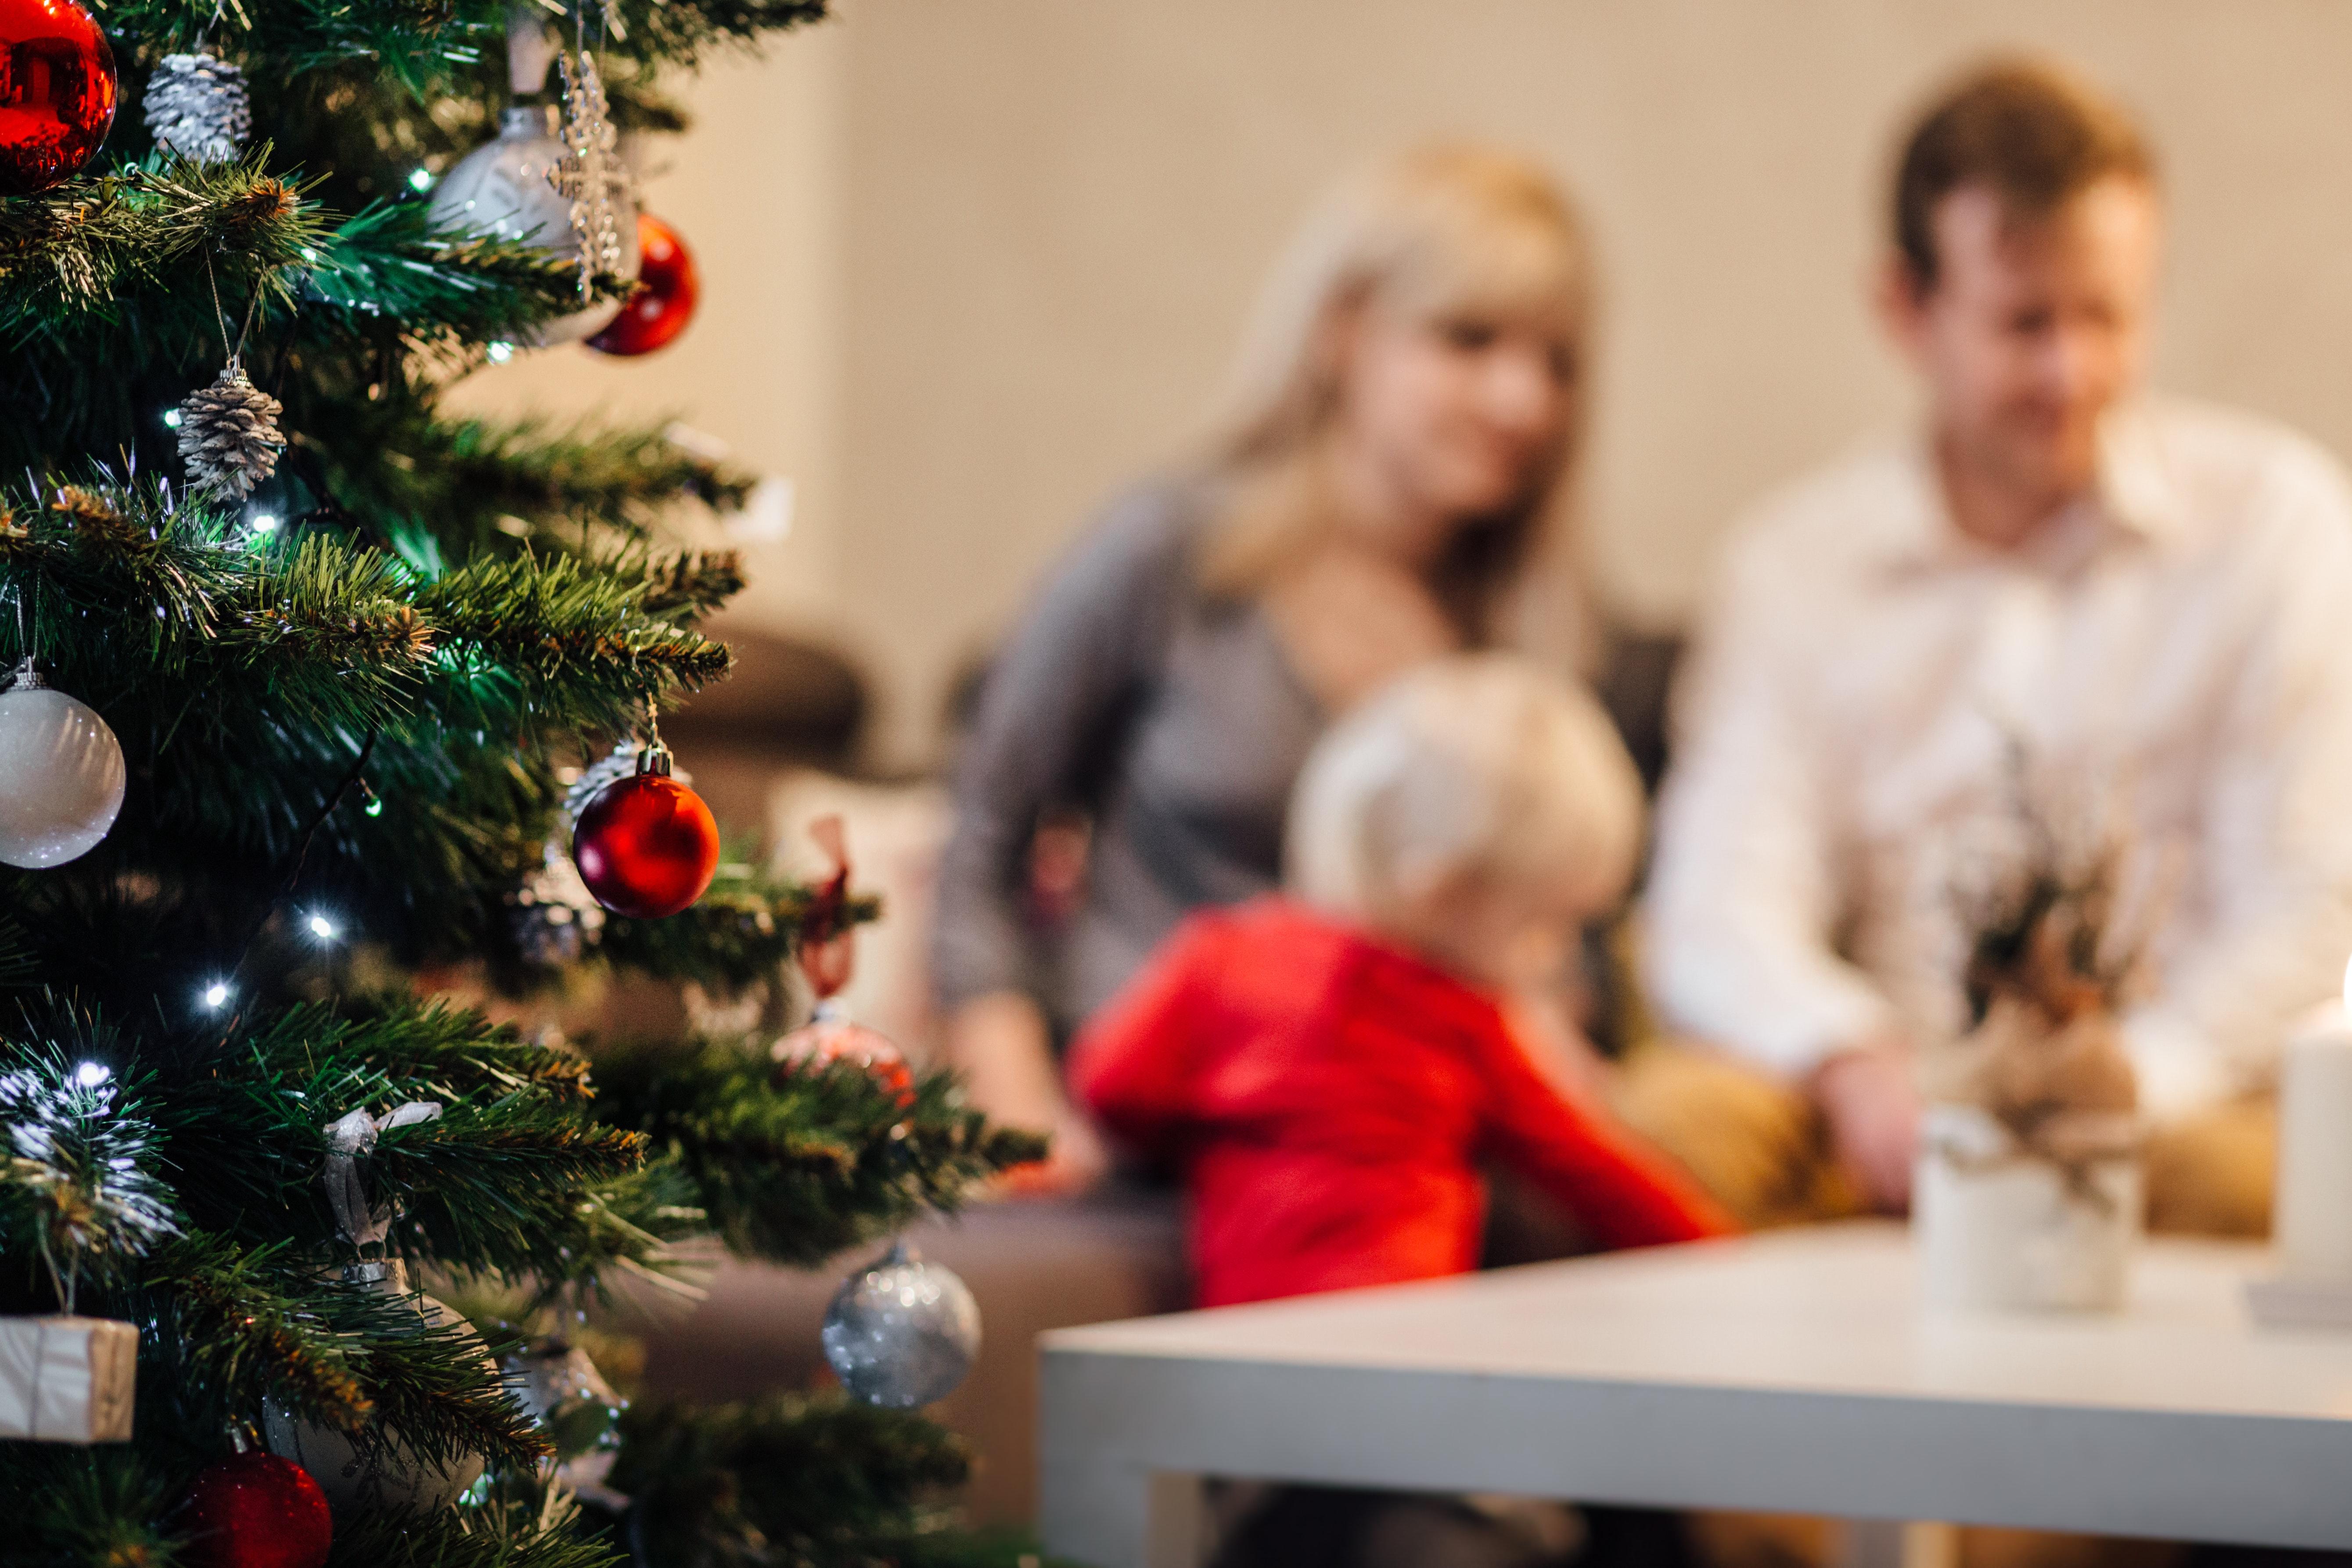 Family Christmas Back Pain